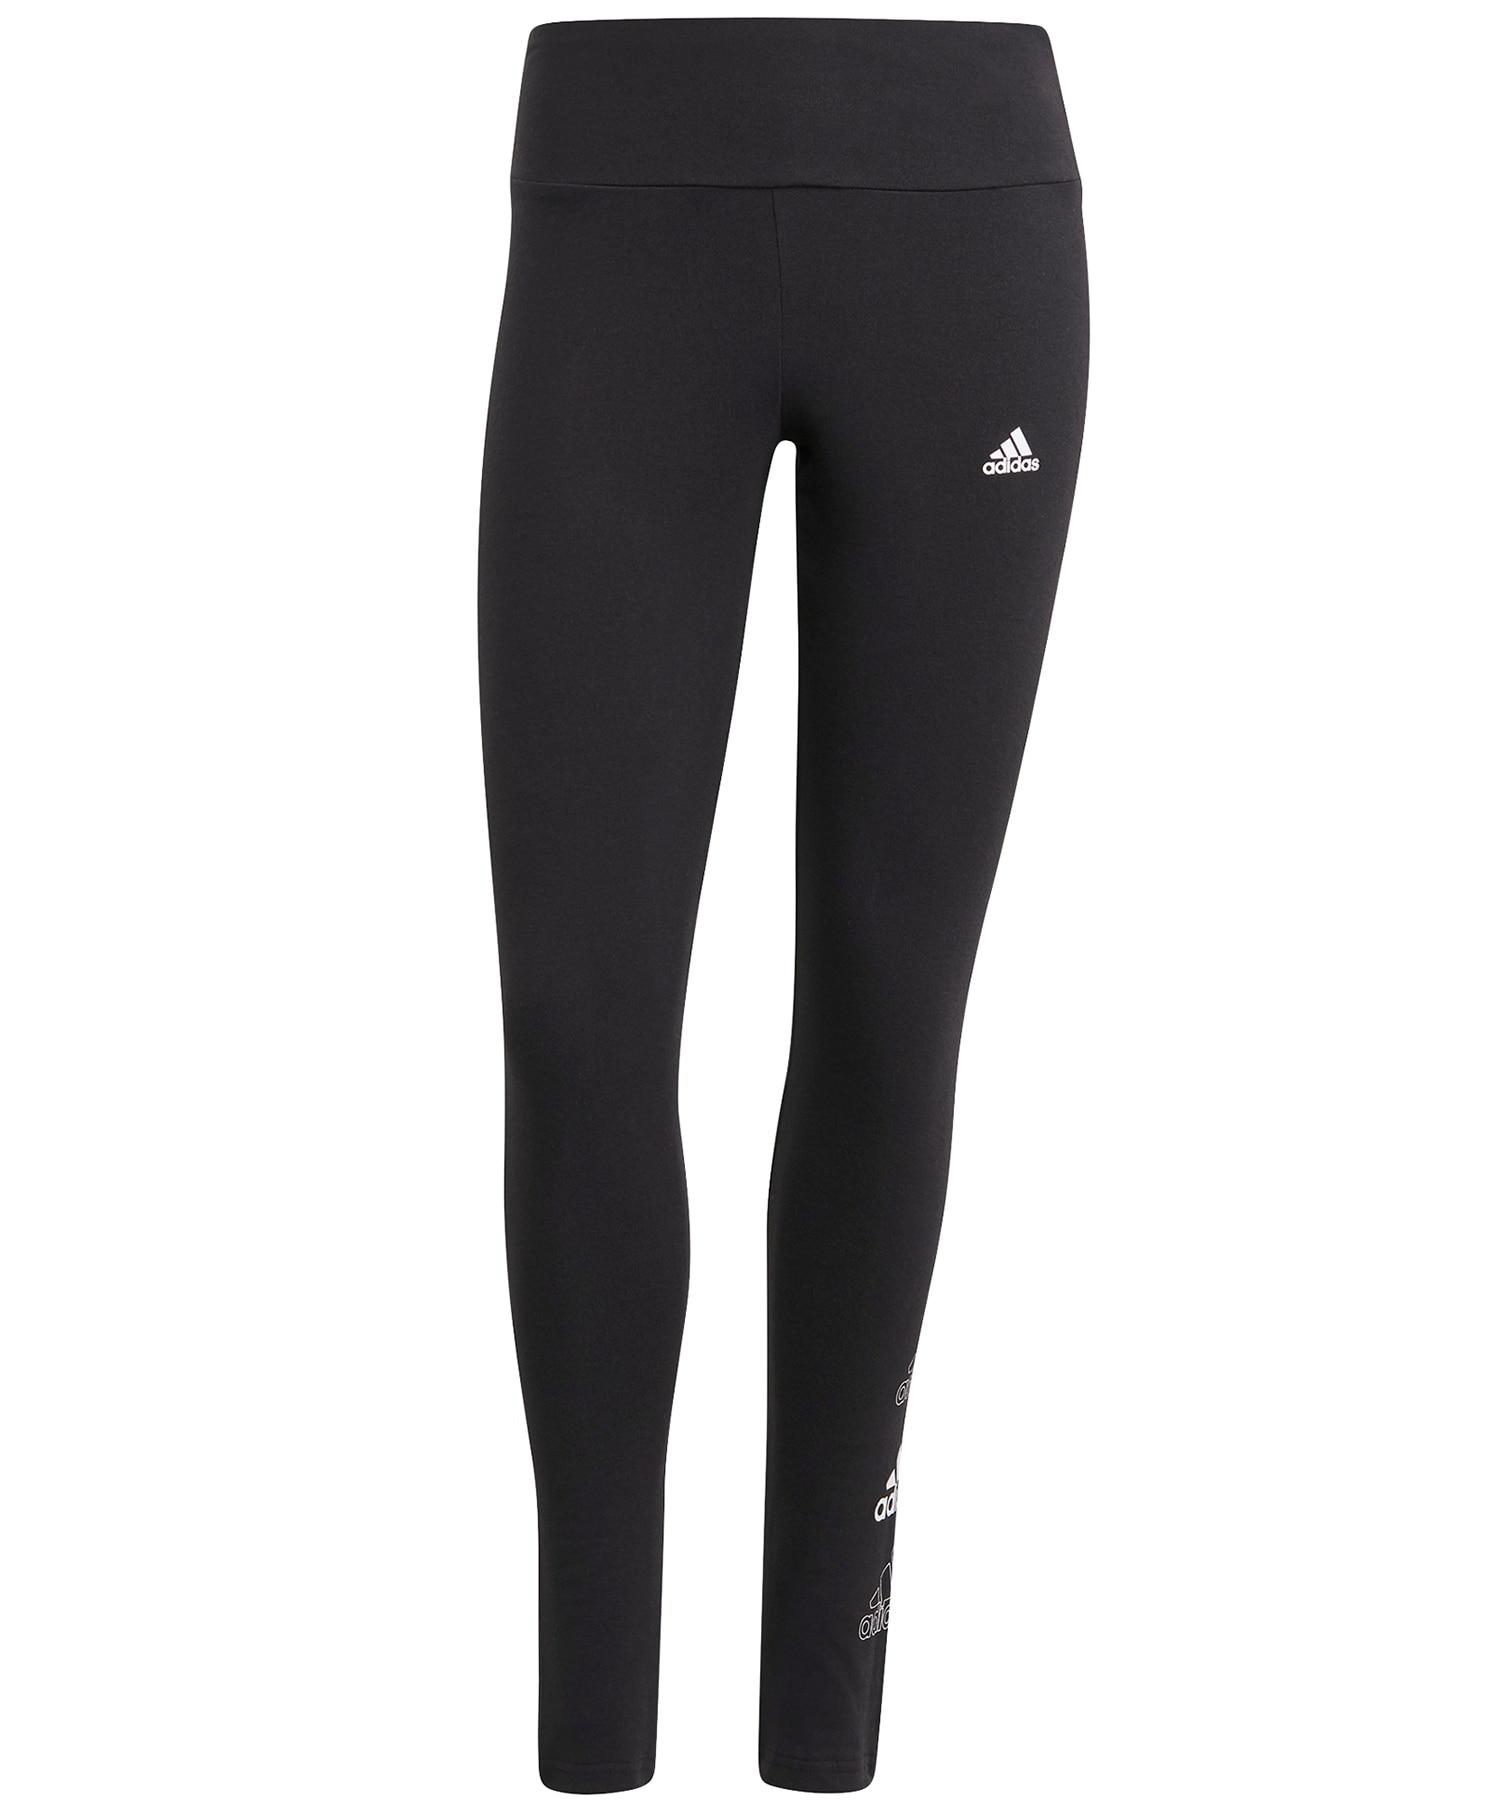 Adidas ws leg tights